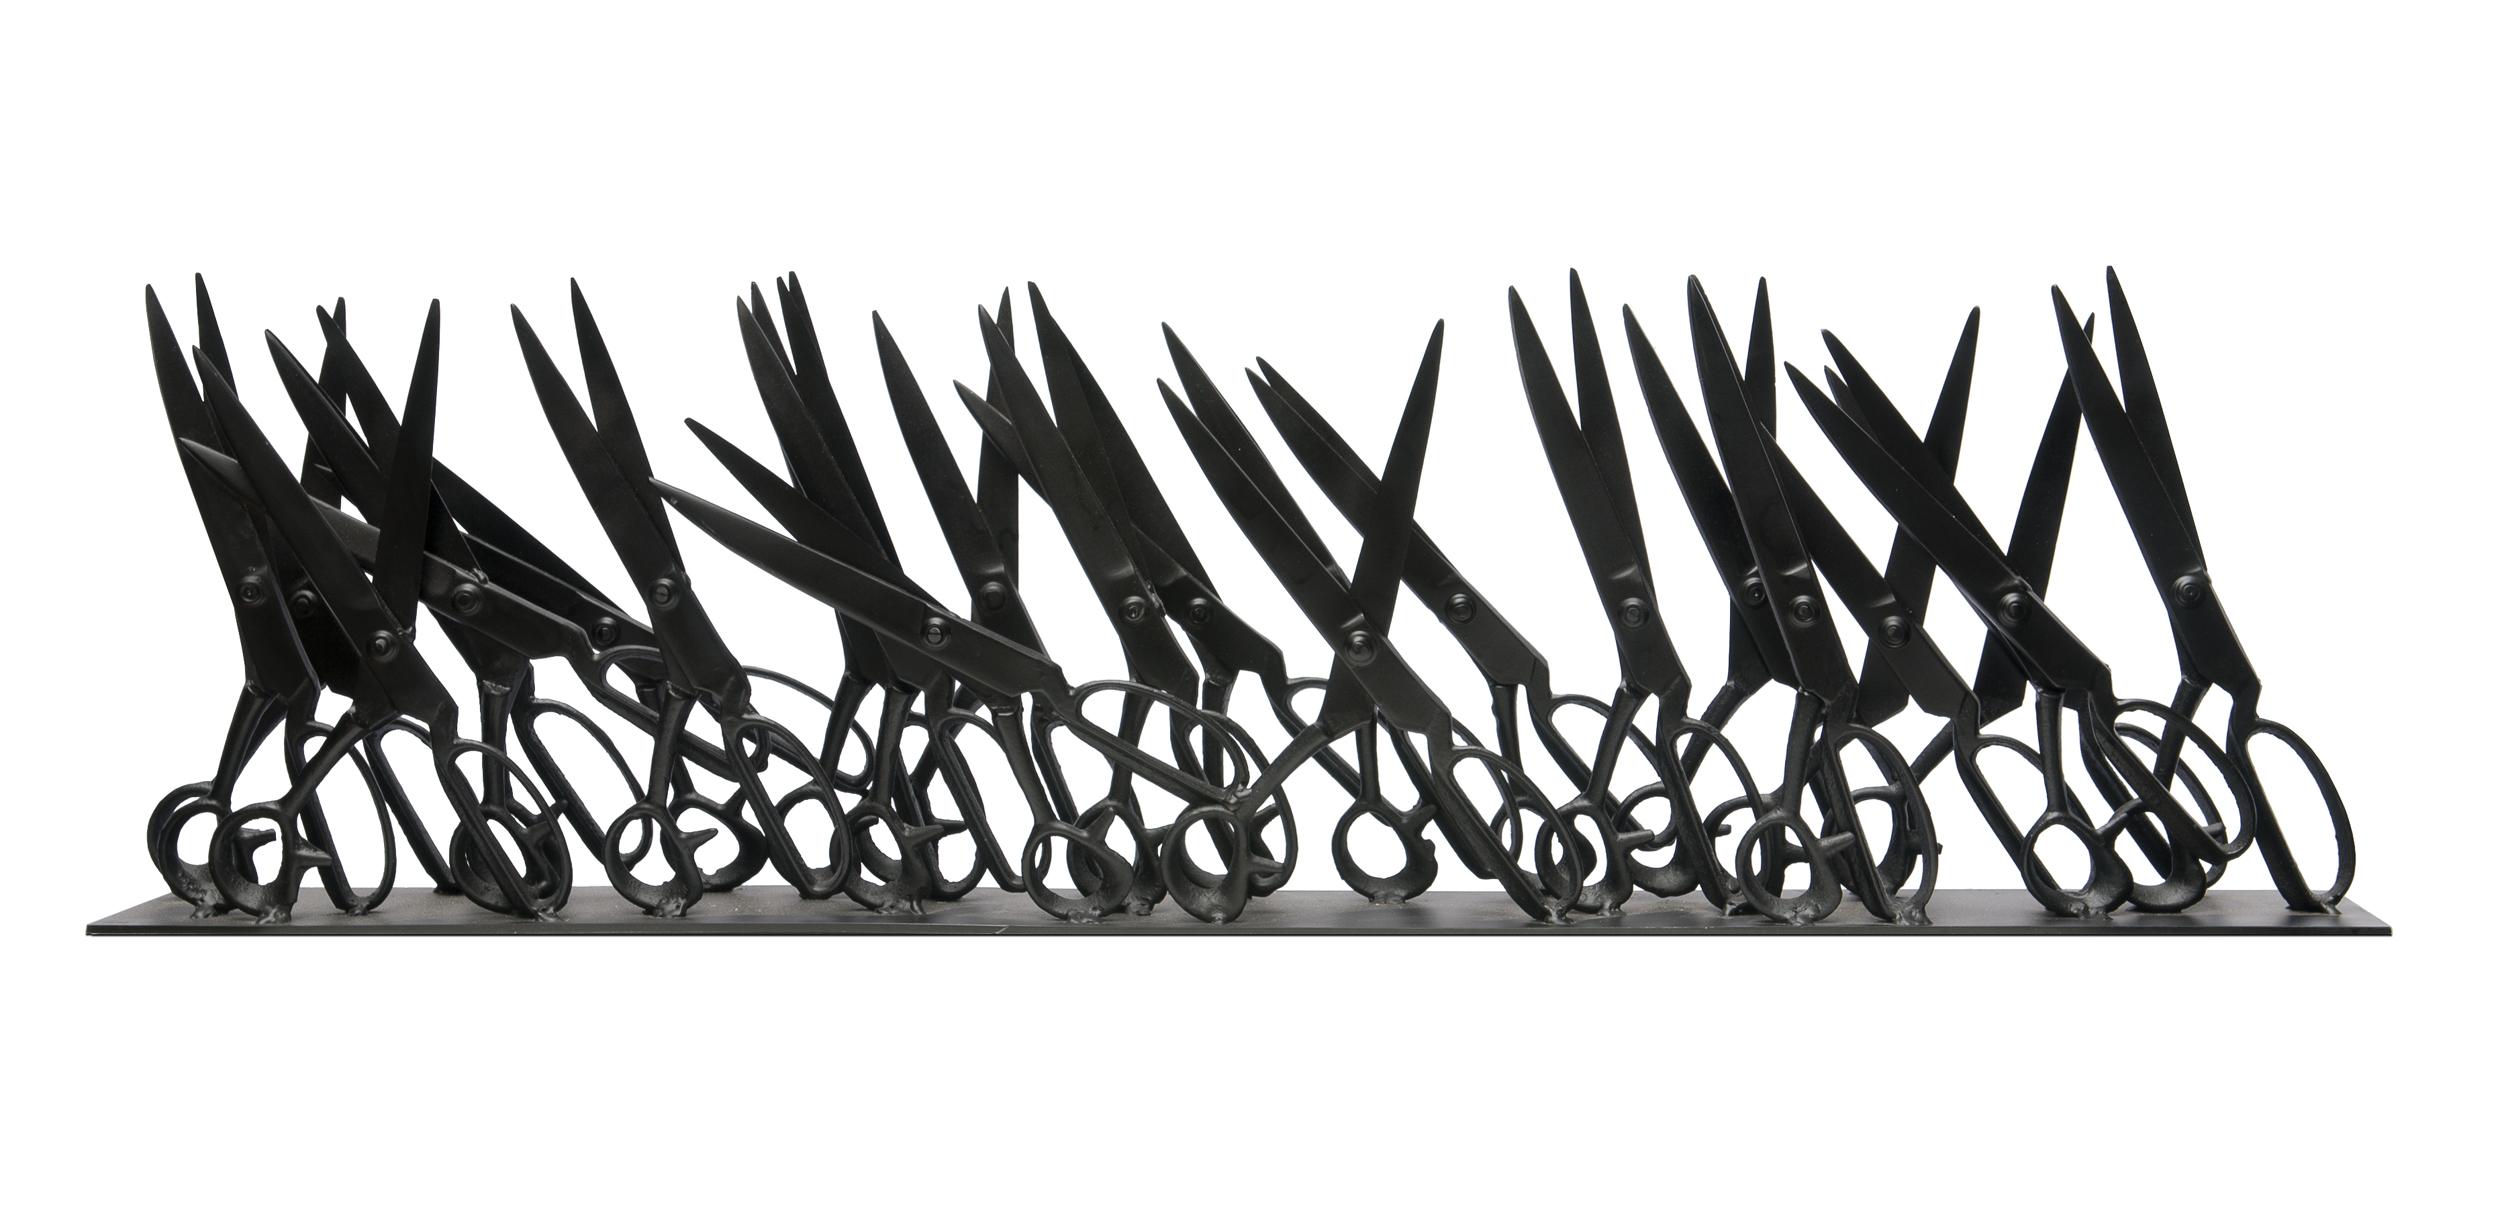 28 POR March of Scissors H290 W1000 D120.jpg